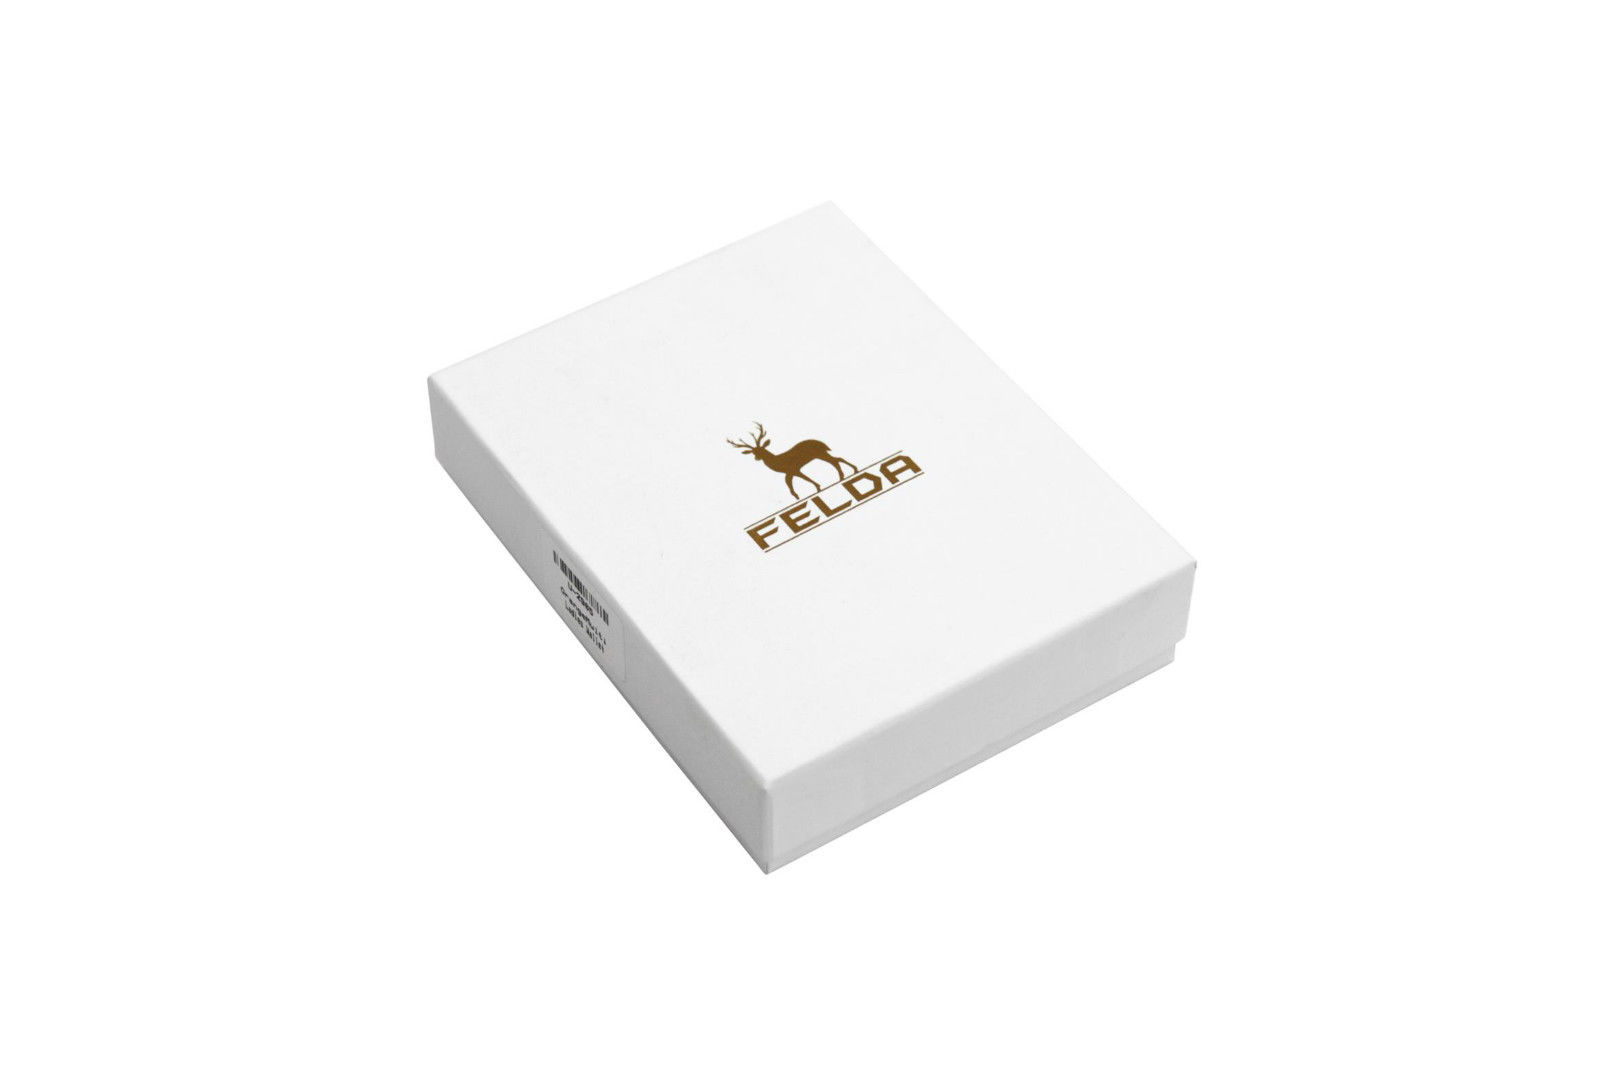 Felda-RFID-onorevoli-MEDAGLIA-amp-Card-Purse-Wallet-Genuine-Leather-Multi-SOFT-BOX-REGALO miniatura 109